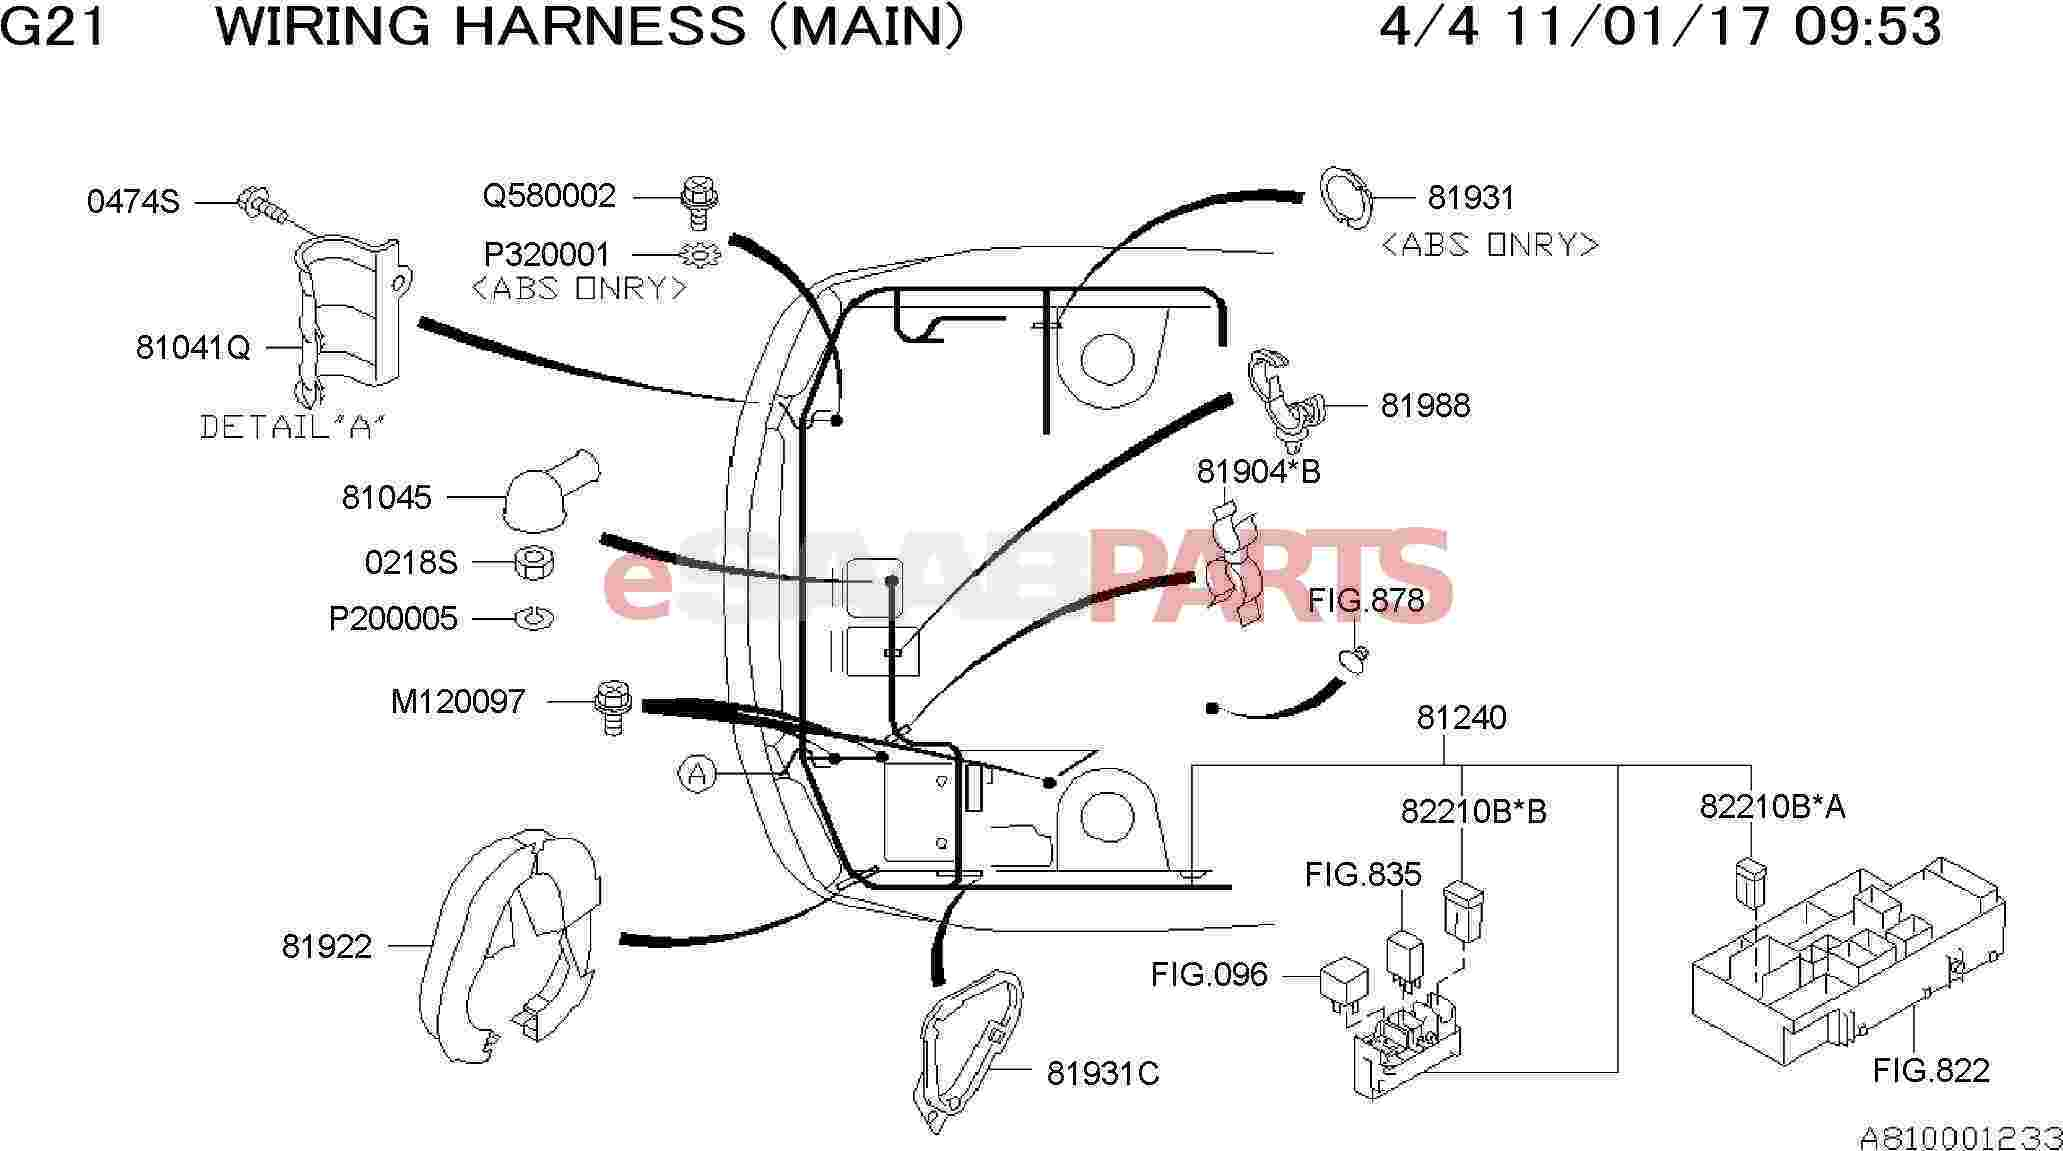 2005 Saab 9 2x Wiring Diagram. Saab. Auto Wiring Diagram